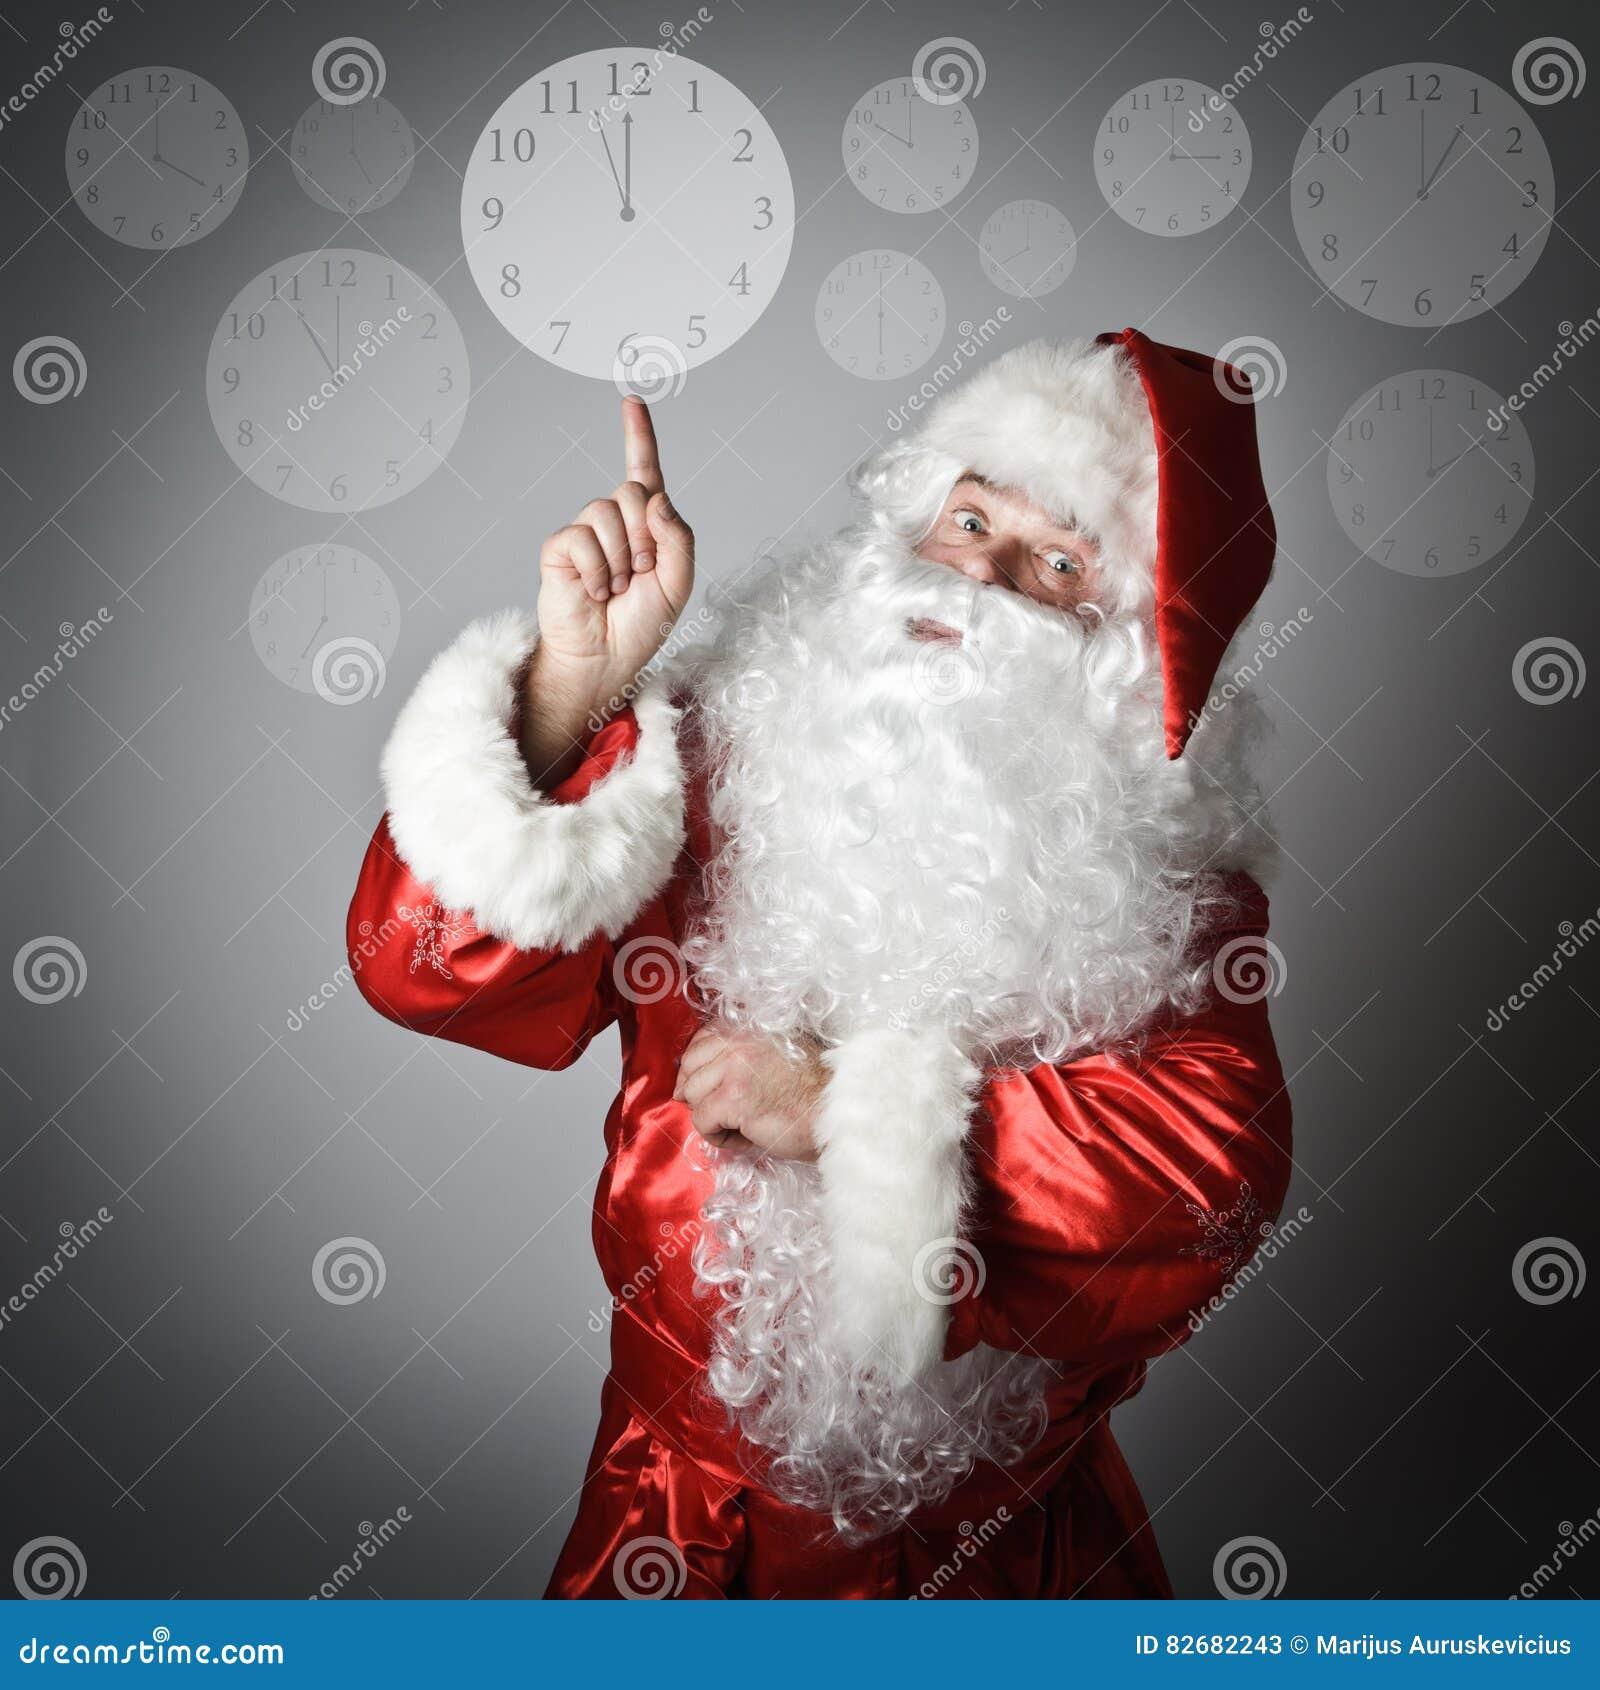 Santa Claus is pointing at the clock